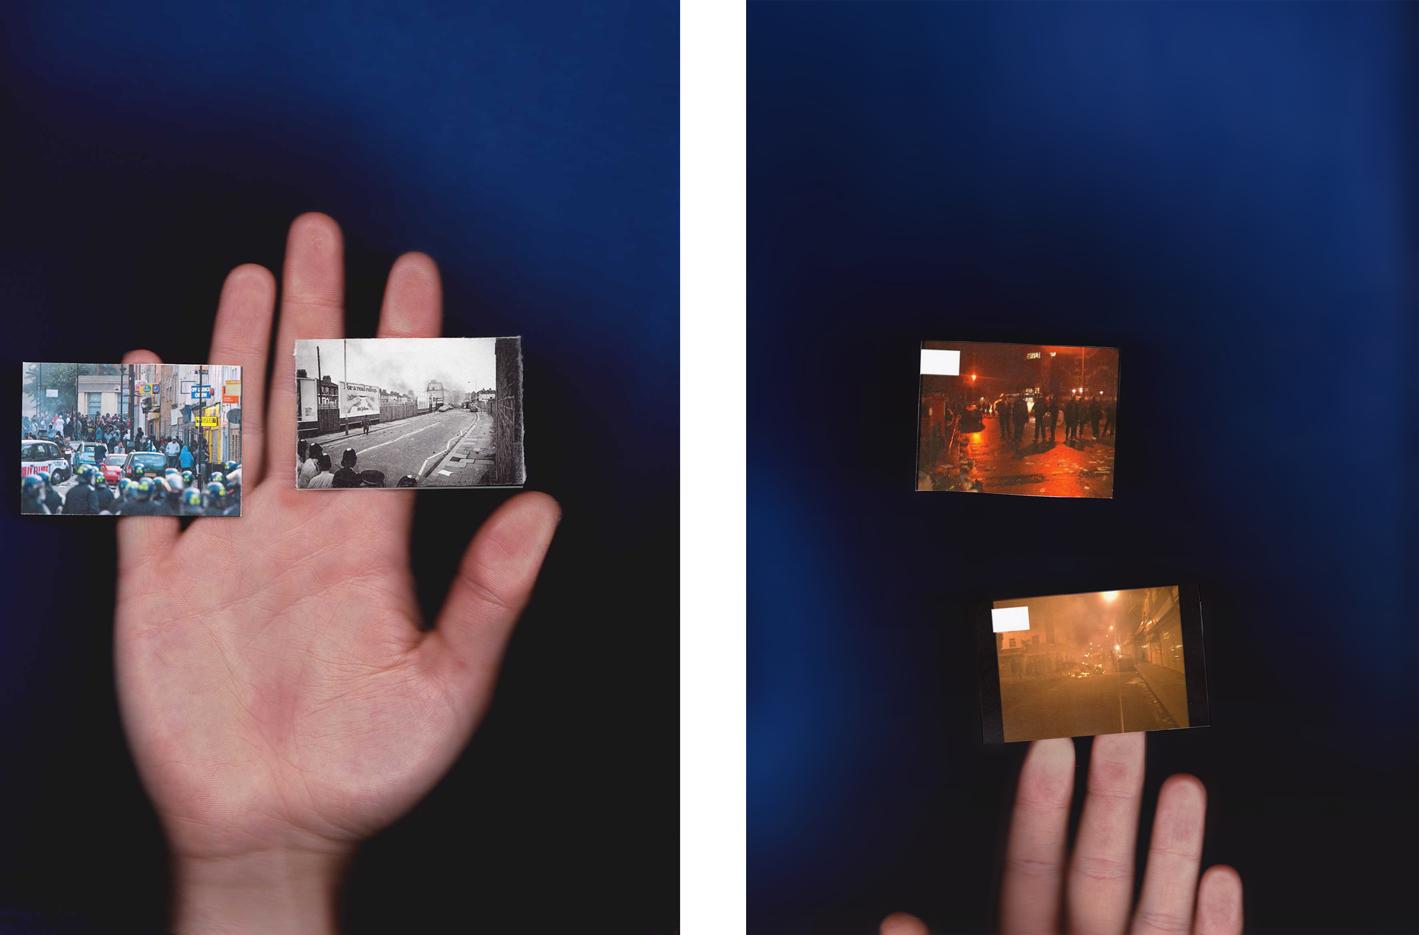 Imagenes recurrentes (2018) - Marco Godoy